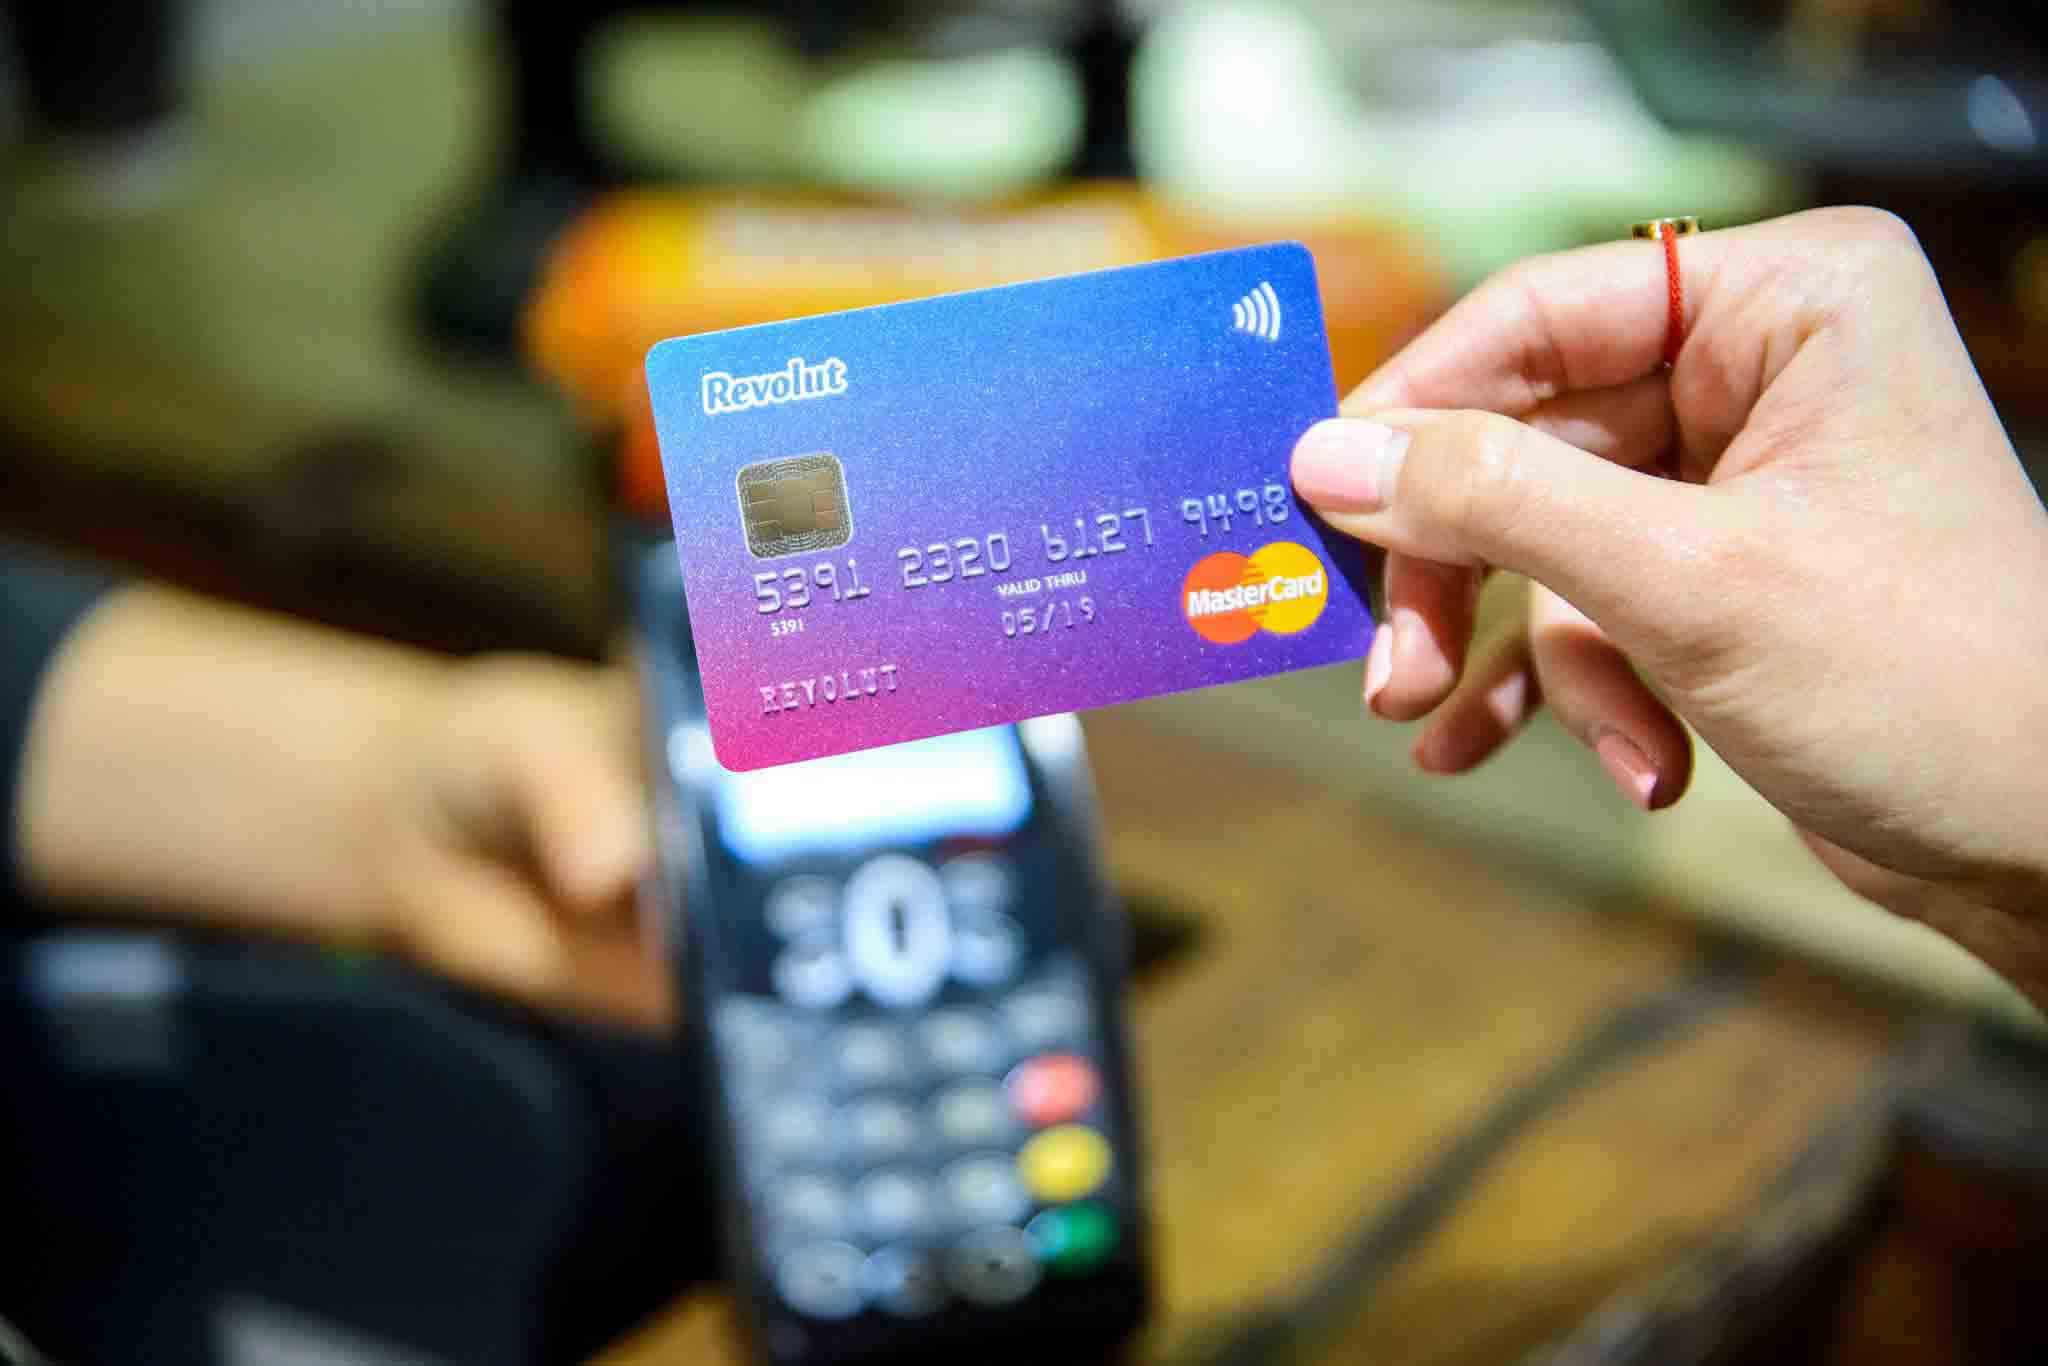 revolut payment